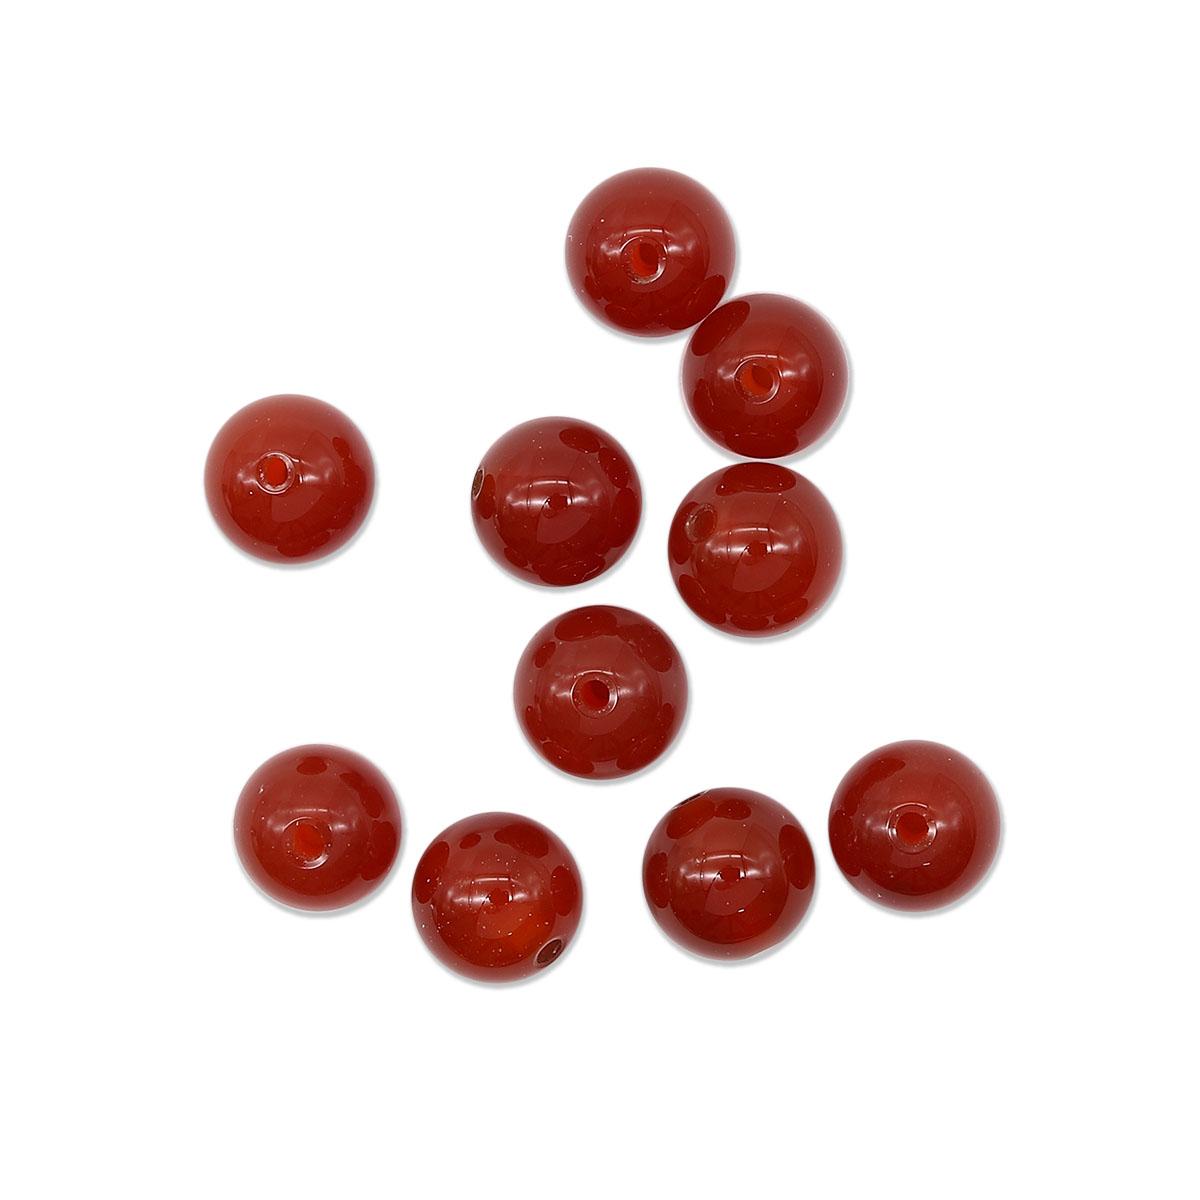 4AR308 Бусины красный агат 10мм, 10шт/упак, Астра